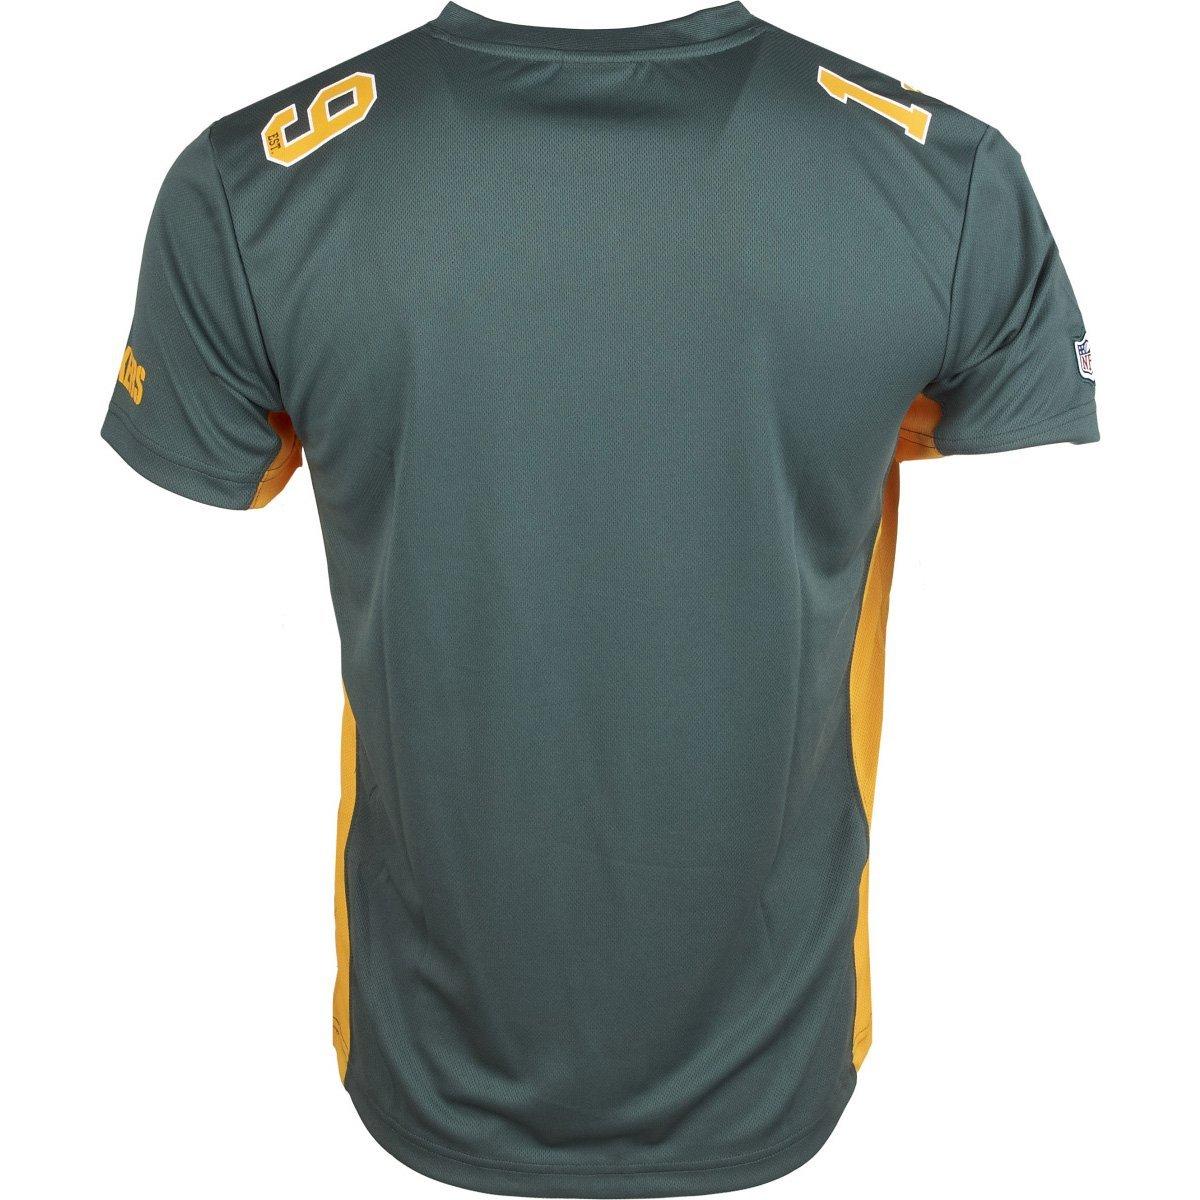 Majestic NFL GREEN BAY PACKERS Moro Mesh Jersey T-Shirt